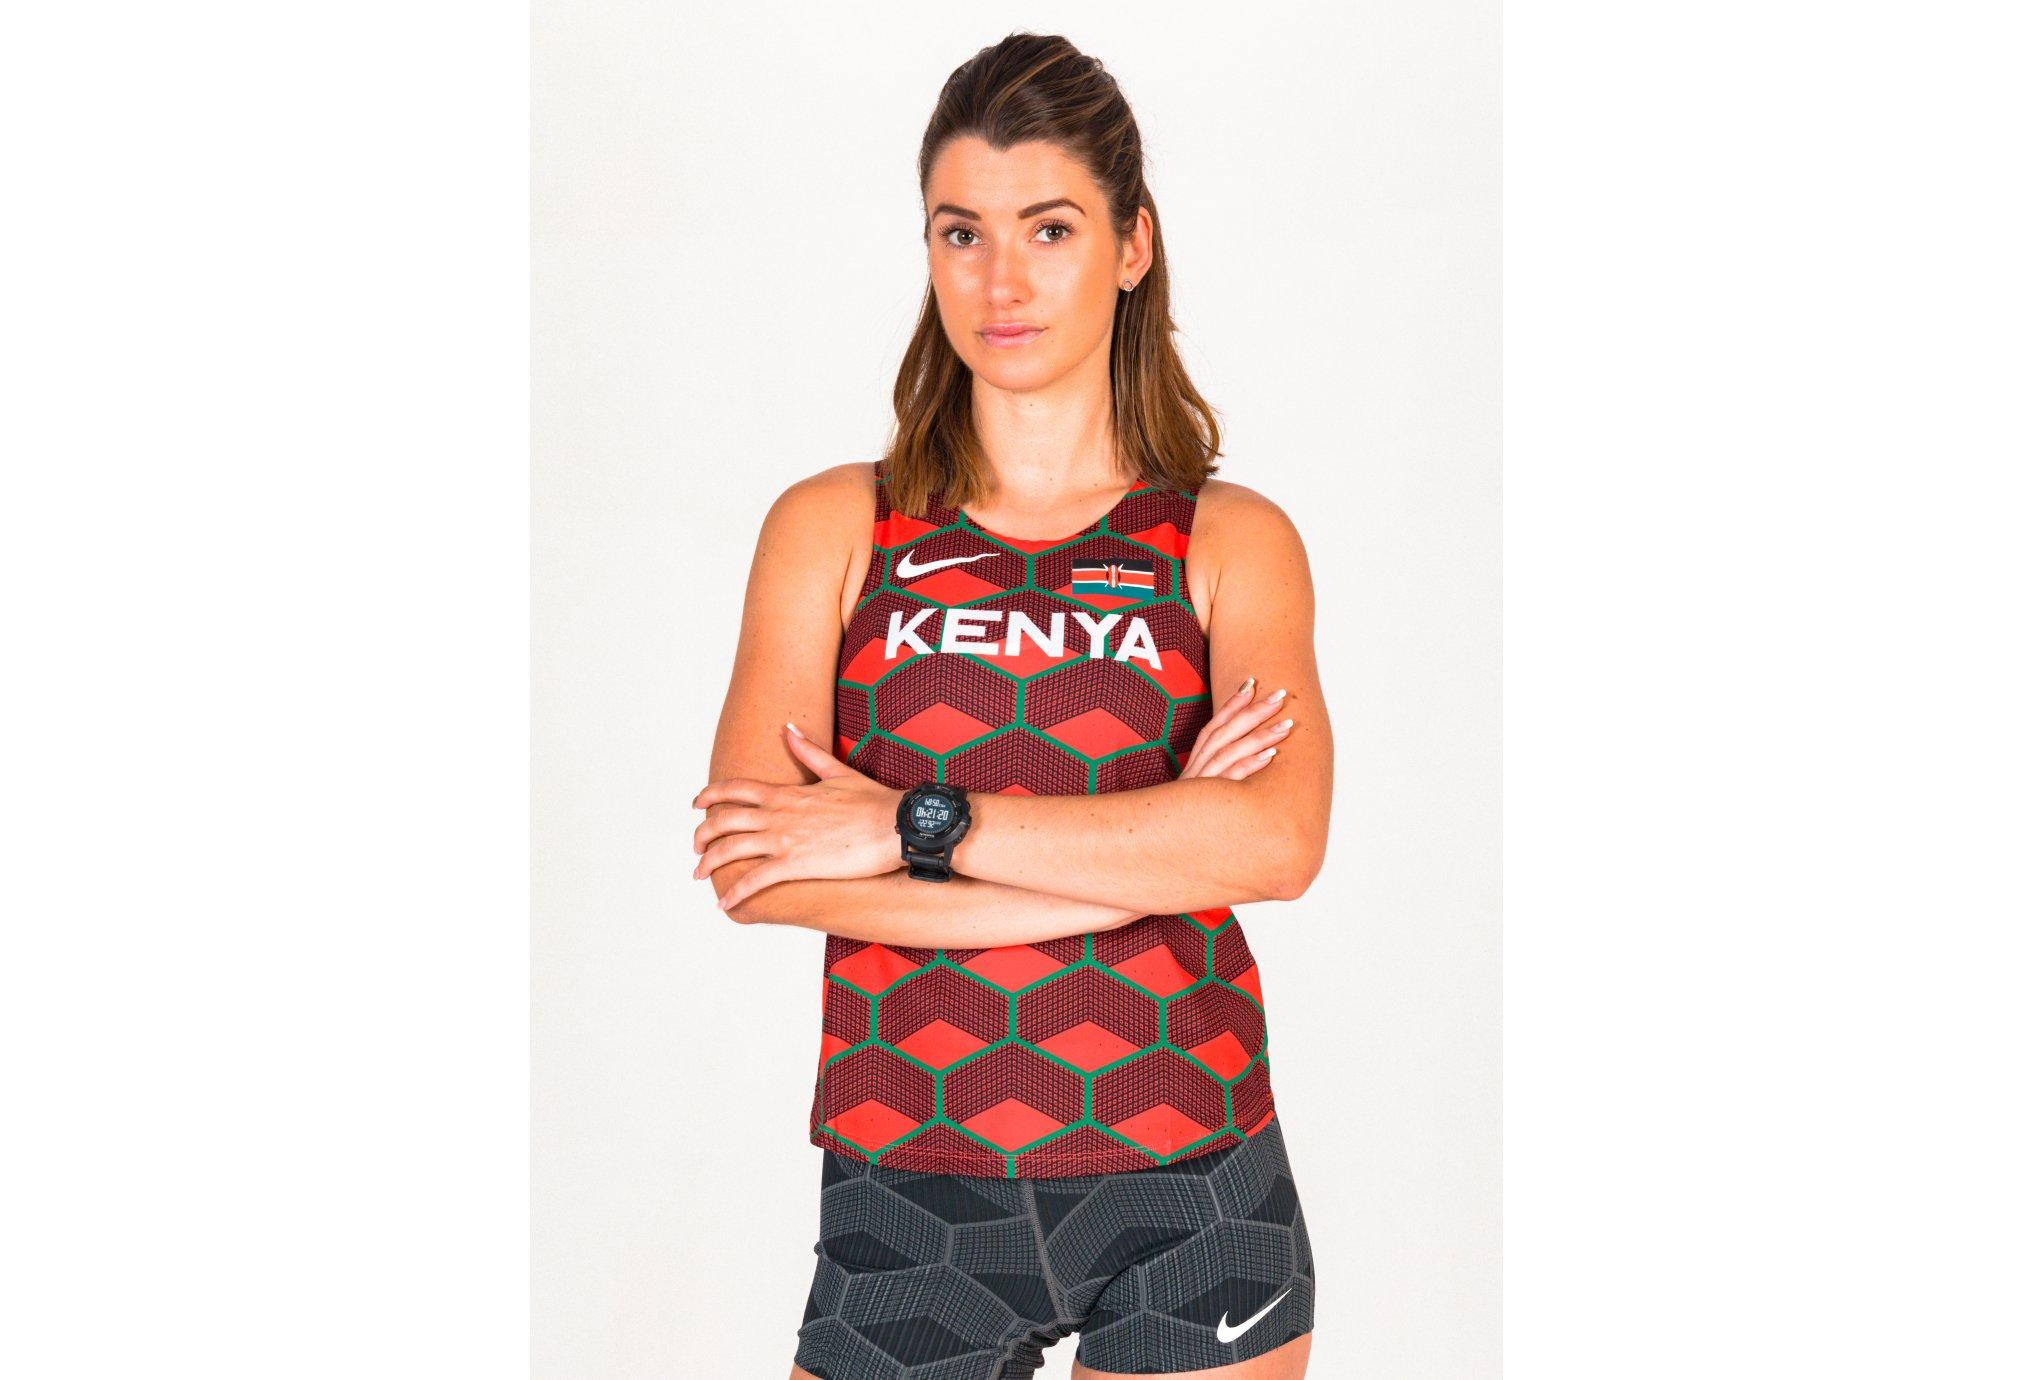 Nike AeroSwift Team Kenya W vêtement running femme